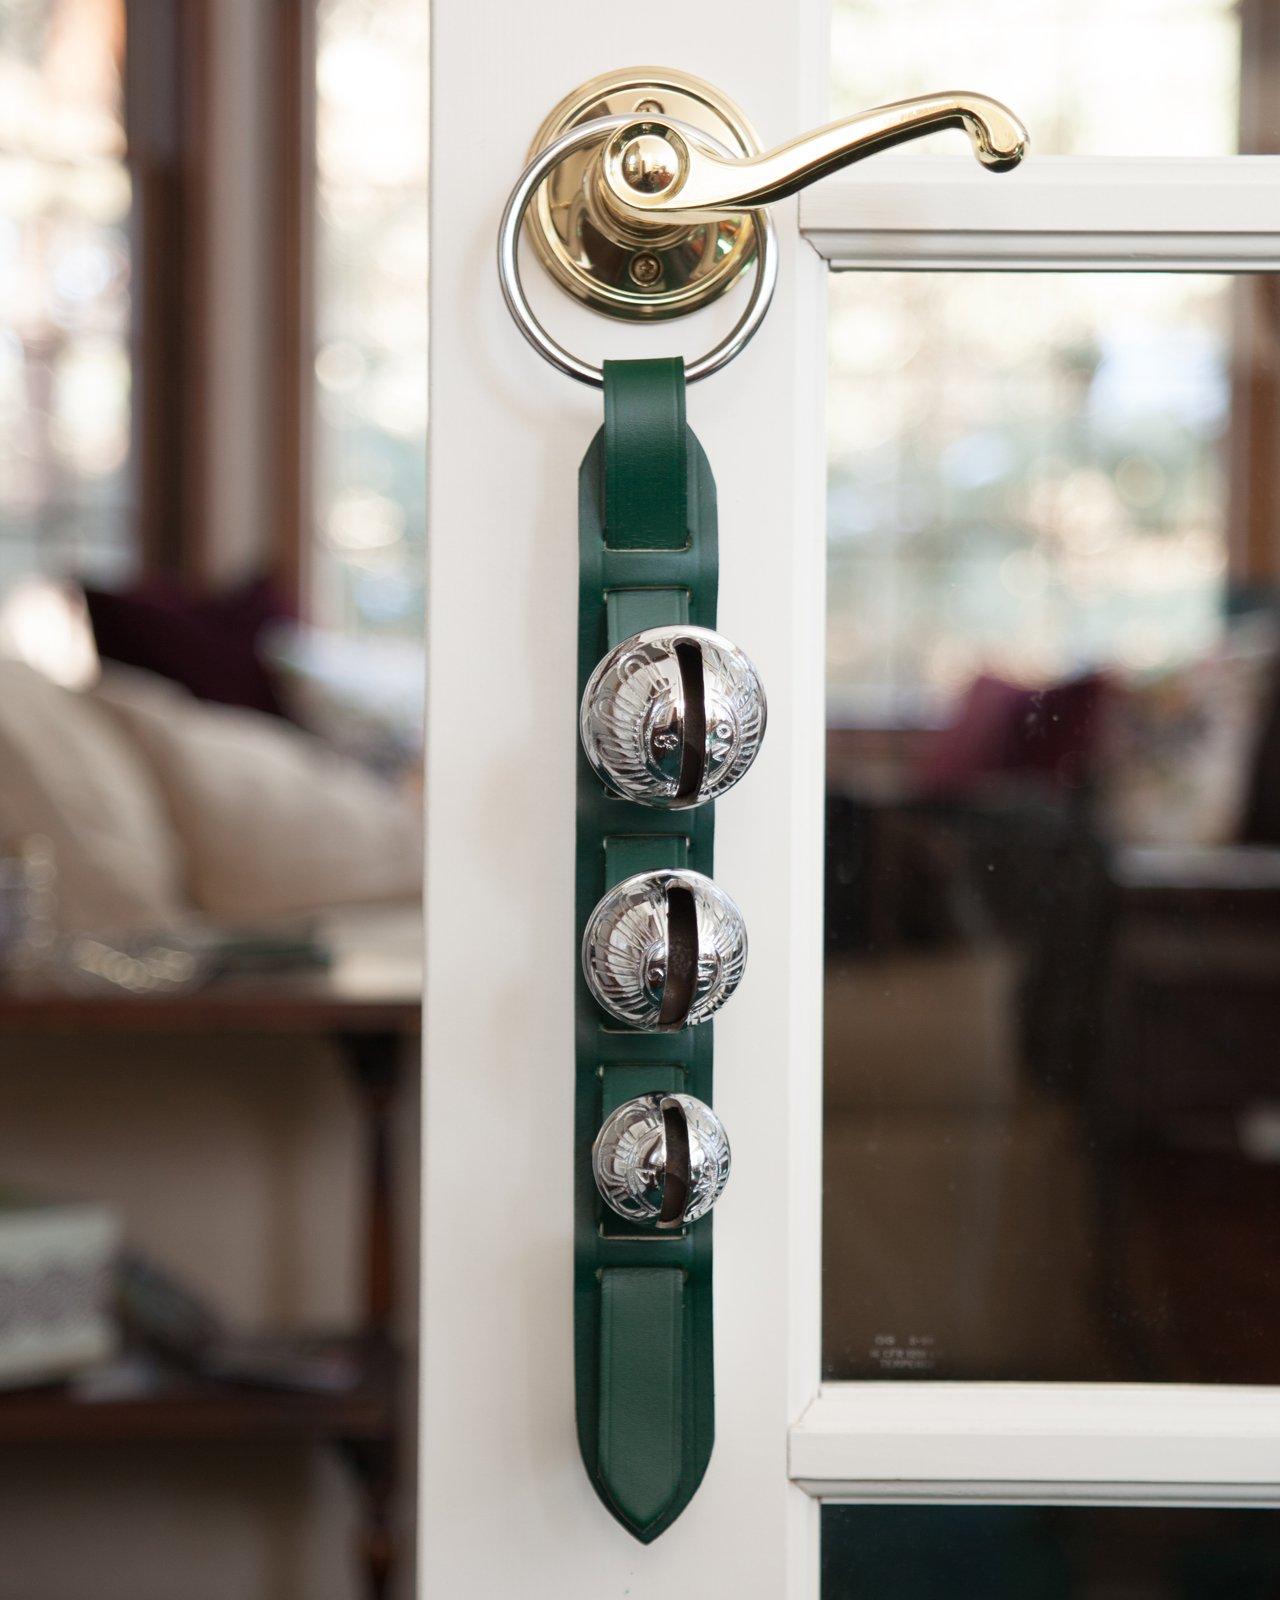 Premium Chrome Green Leather Horse Sleigh Bell Door Knocker 3 Brass Bells